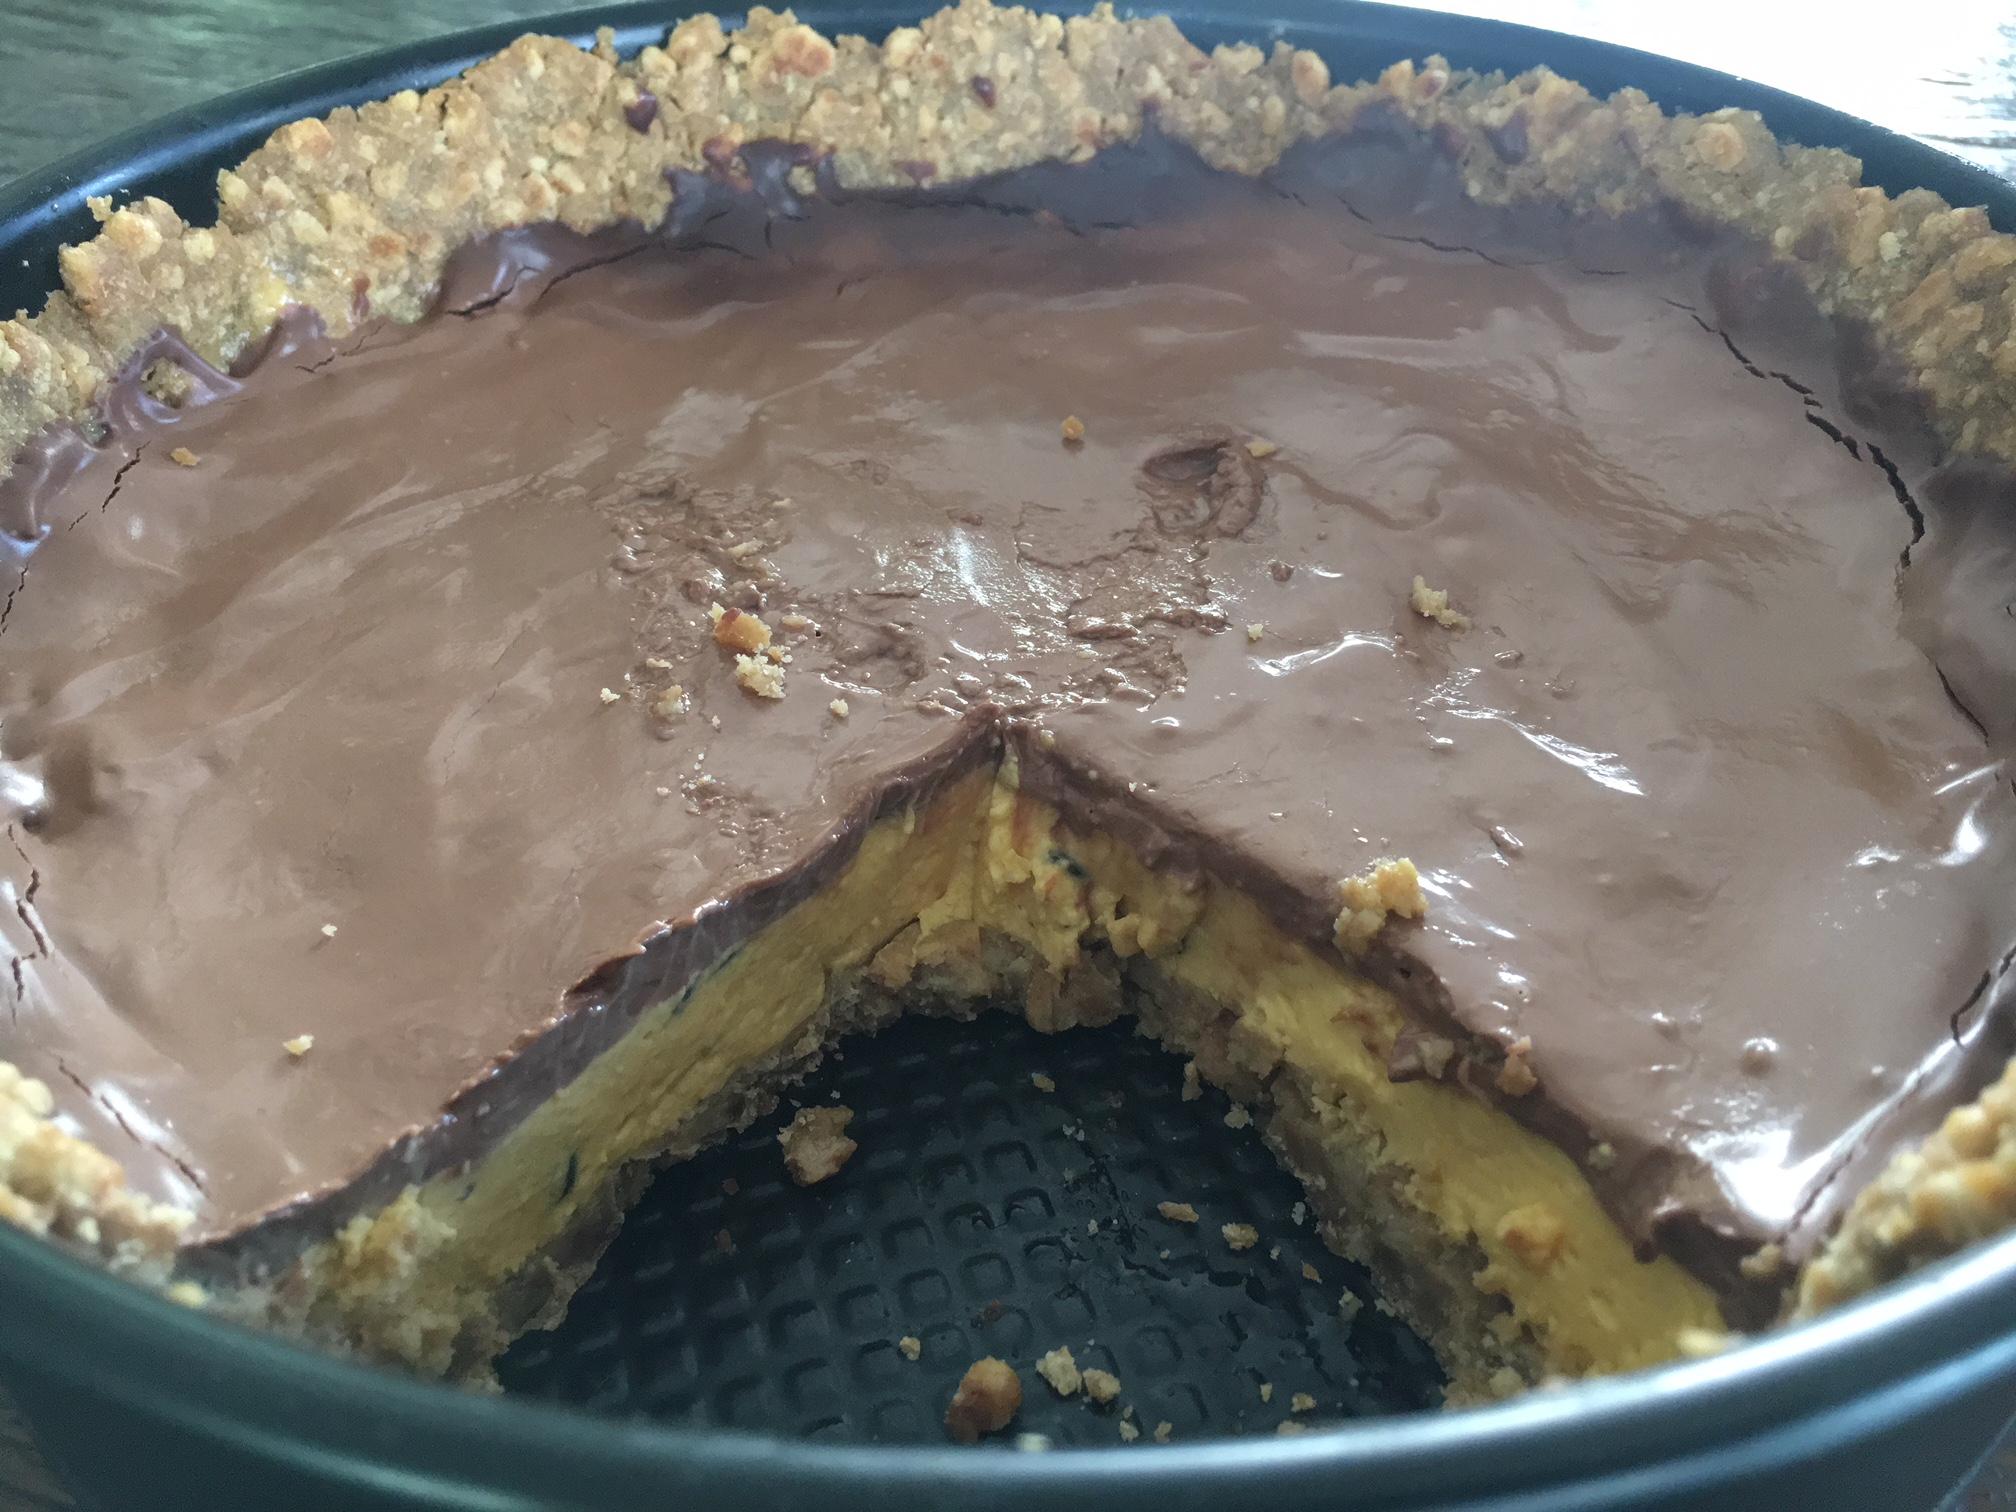 torta-stroop-elis-cortada